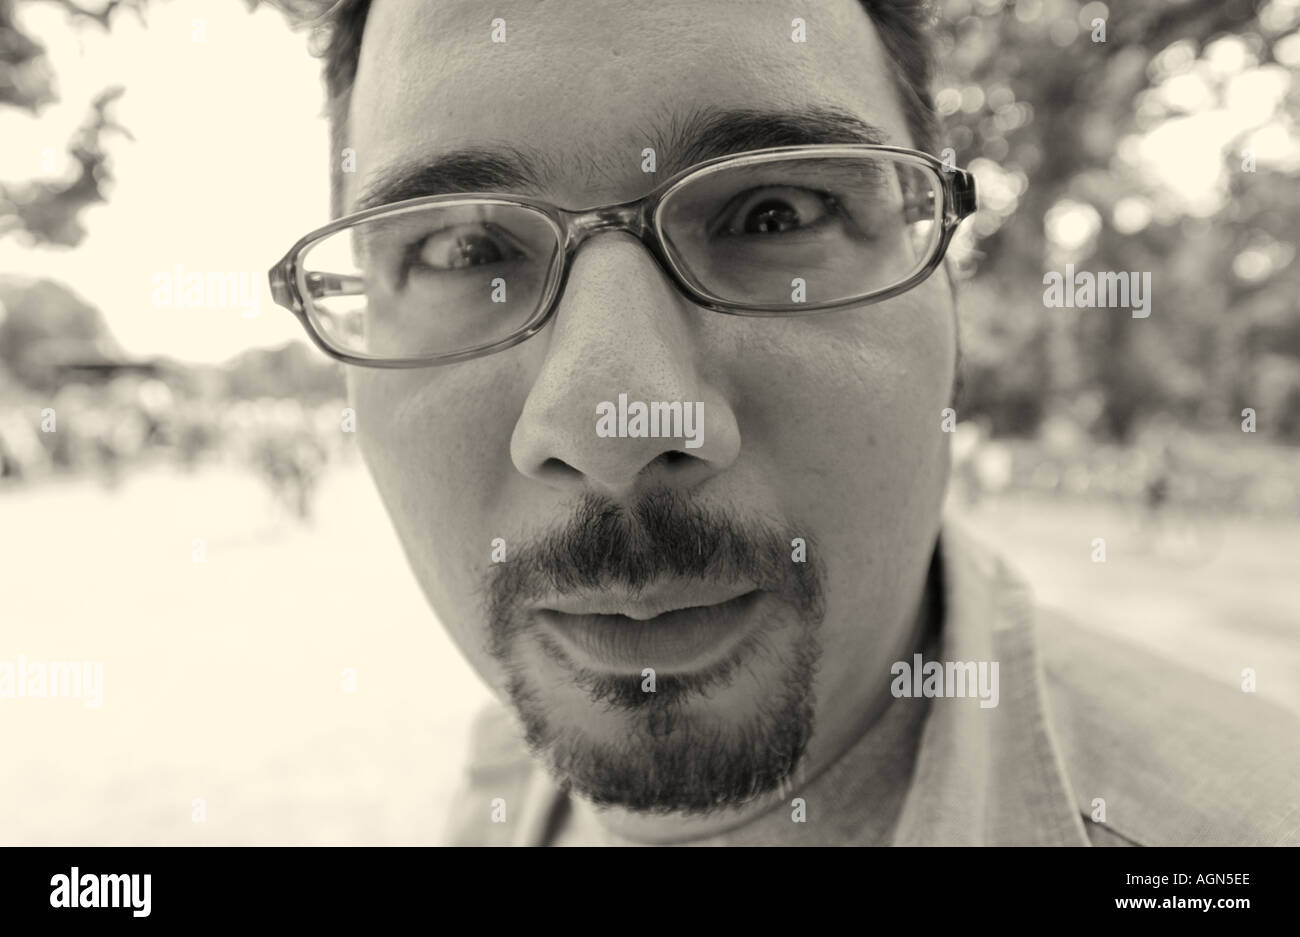 2d84ca3f0ef funny portrait of a man glasses moustache close up distord distorted nose  big look looking black